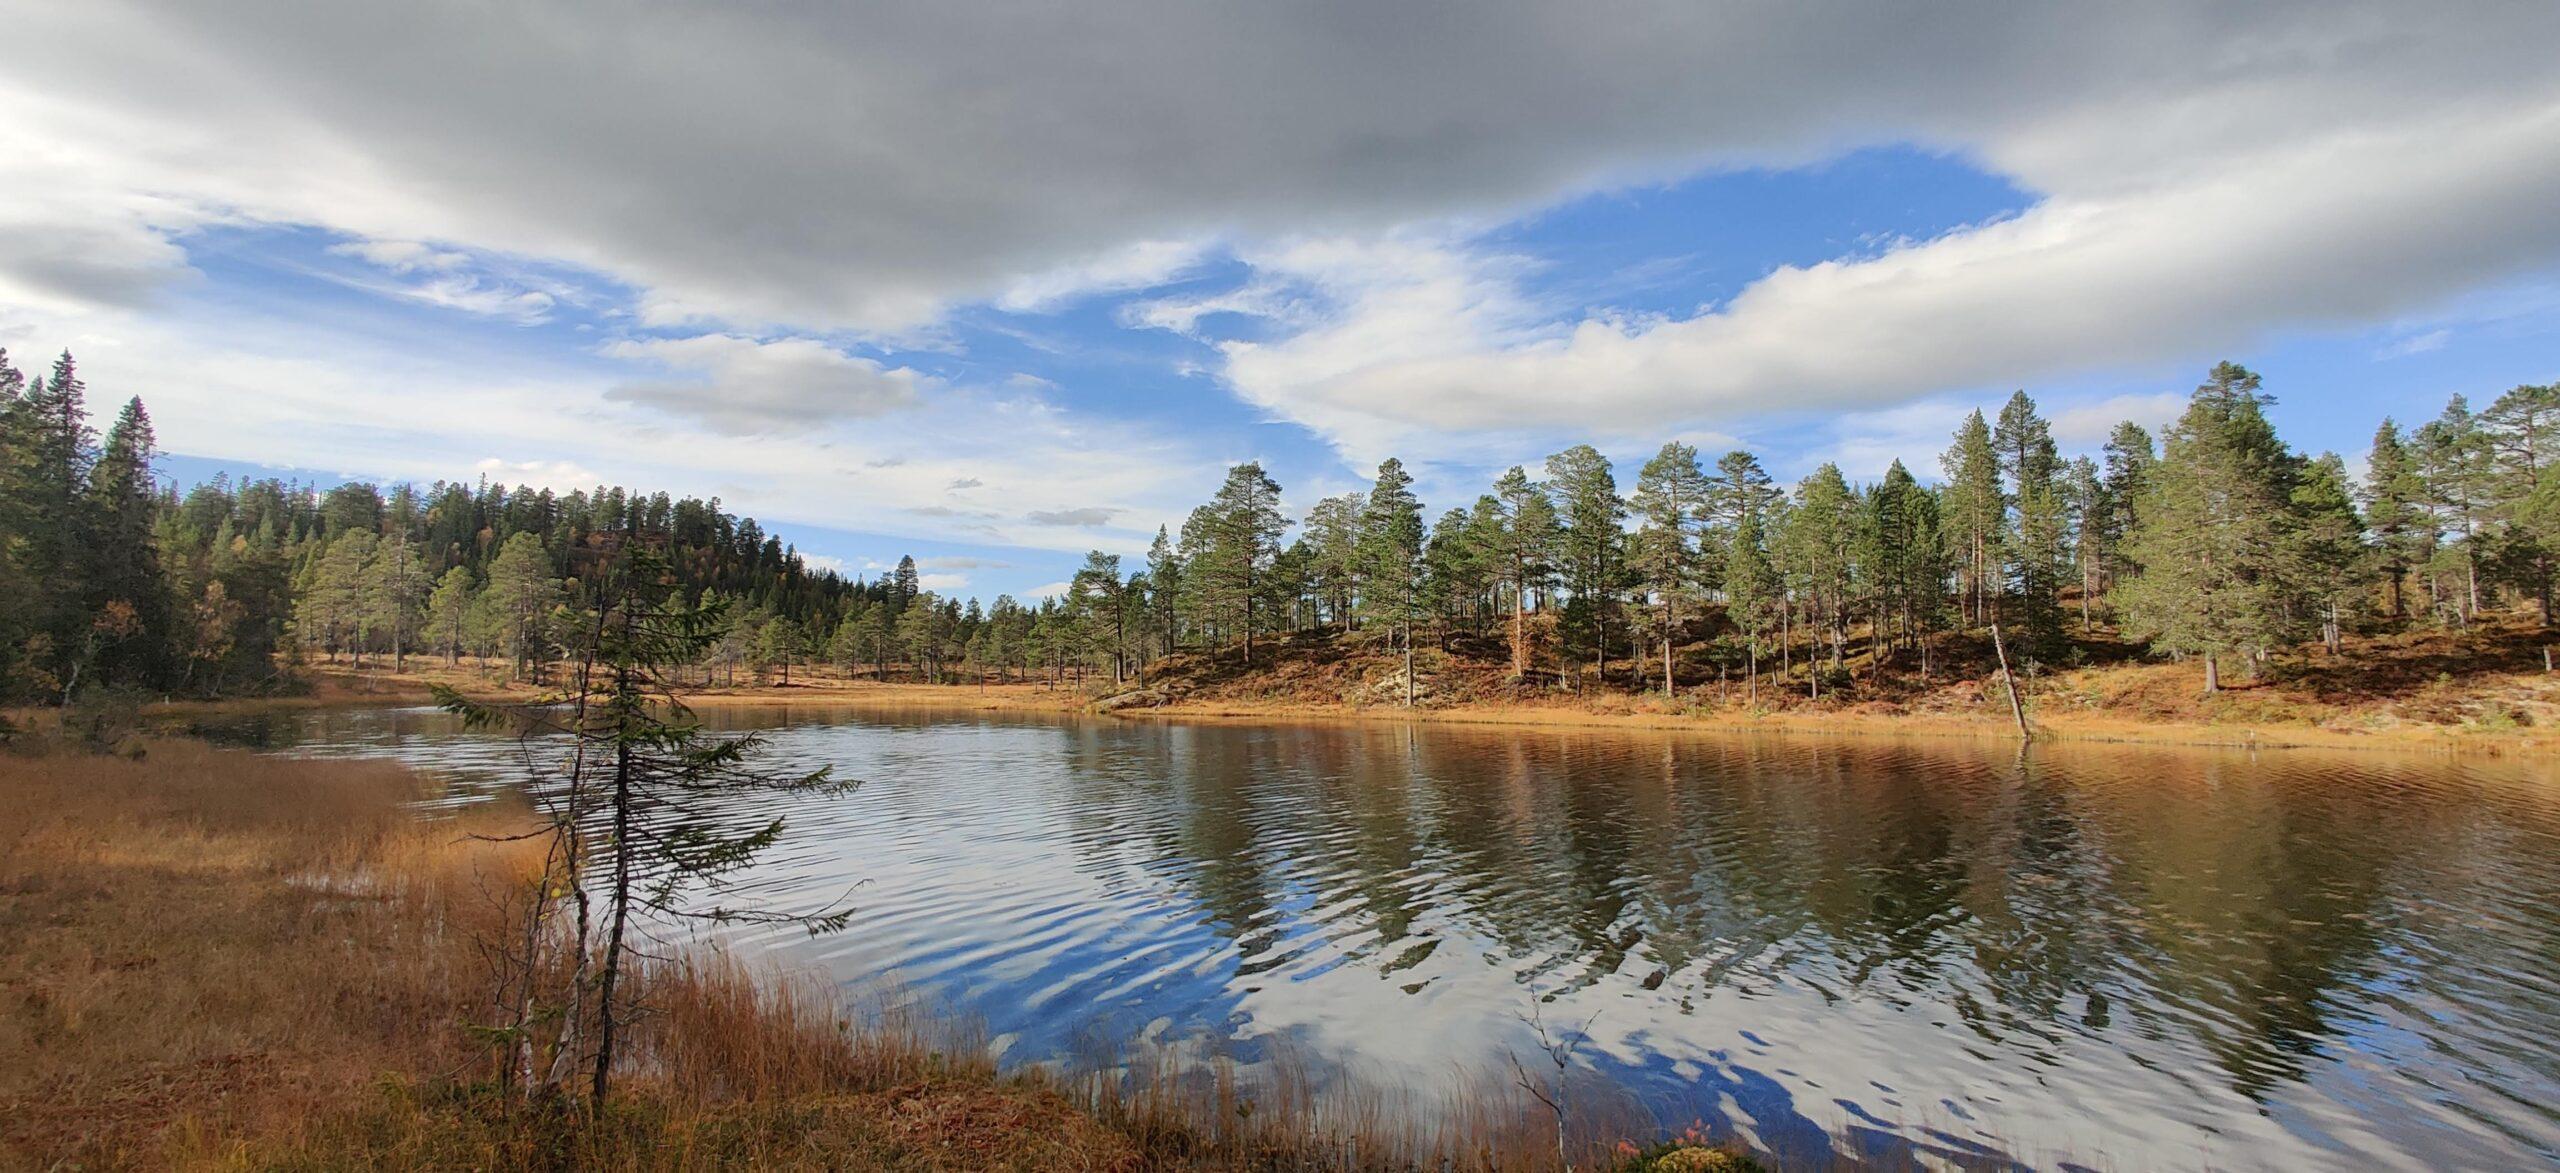 Vann i skogen (bilde)